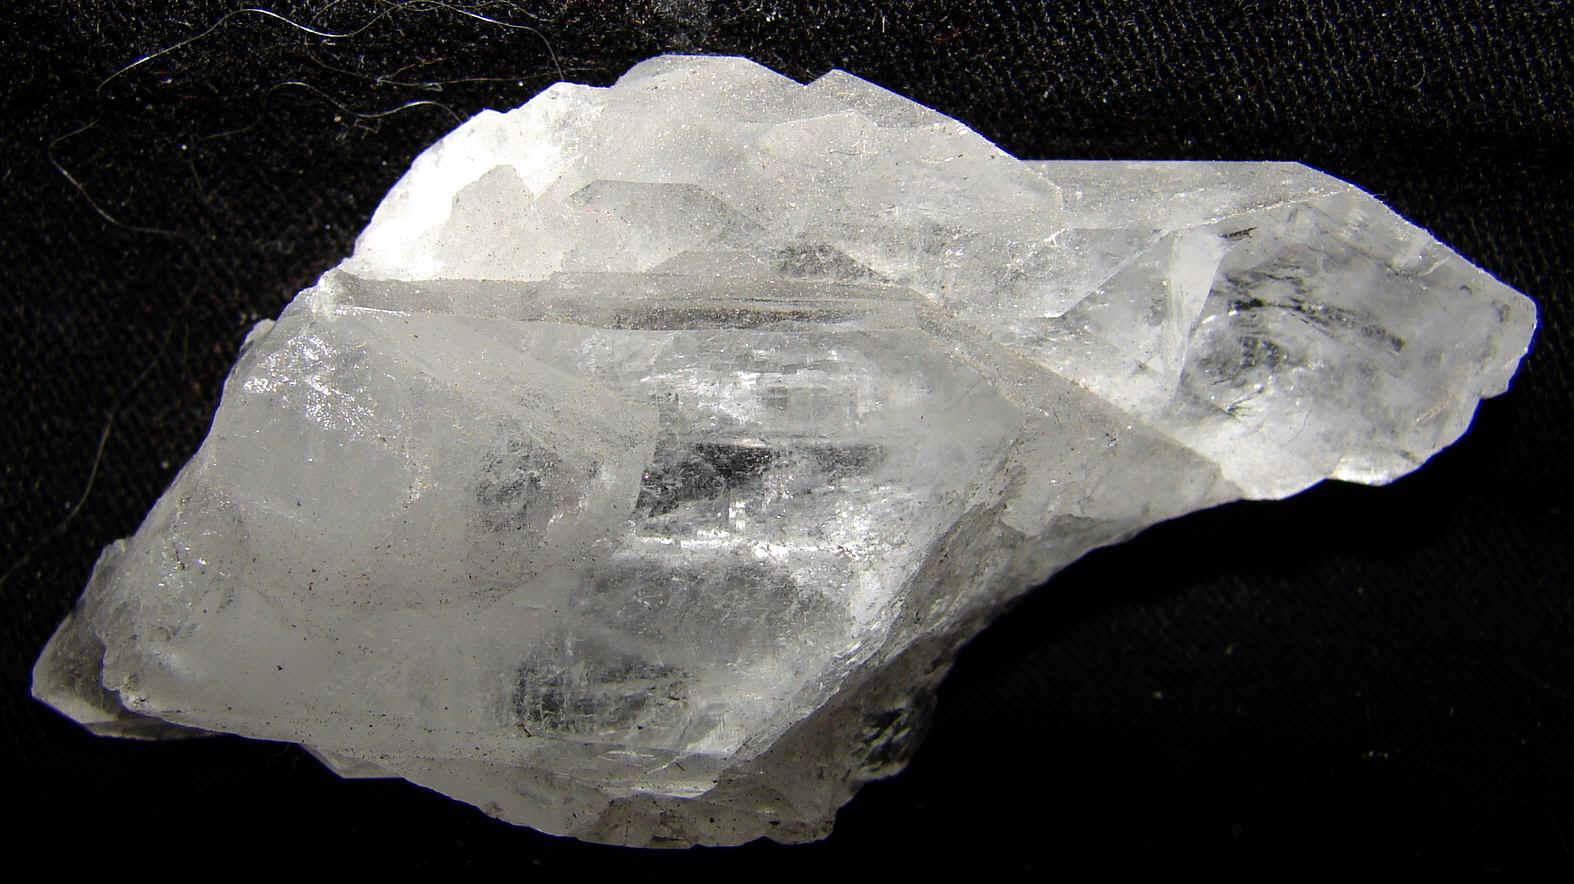 http://www.quartzcrystals.net/icexl-23.jpg (582341 bytes)